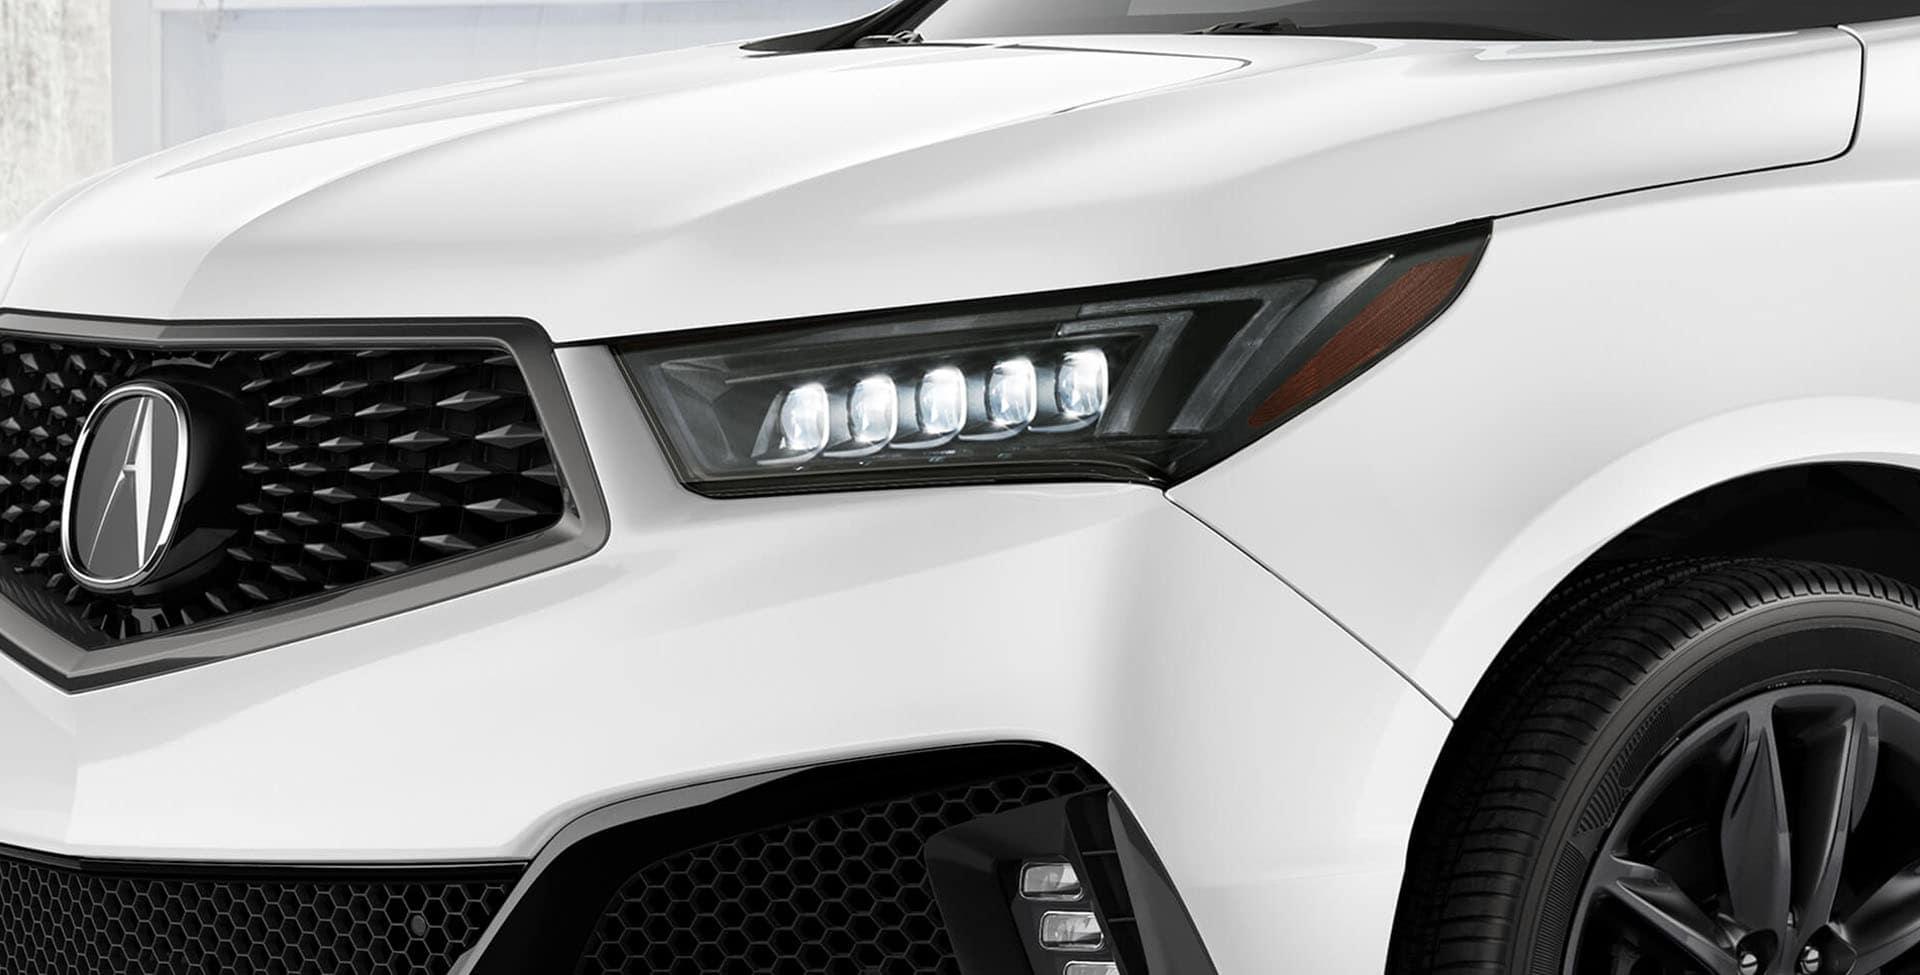 Acura MDX dark shadow accents